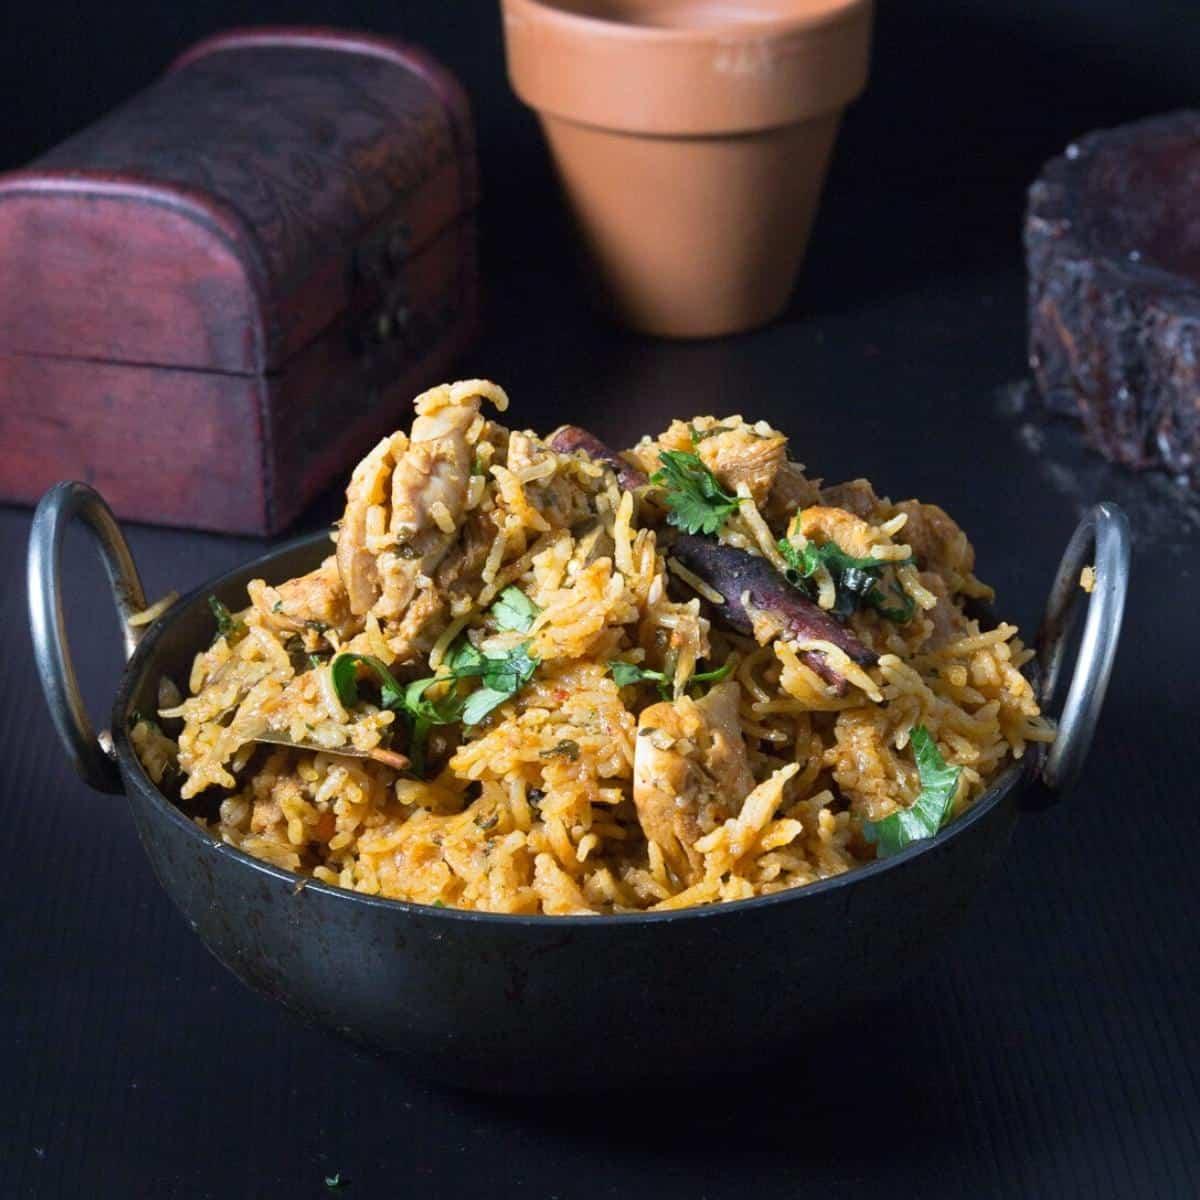 An Indian kadai served with Instant Pot Chicken Biryani.